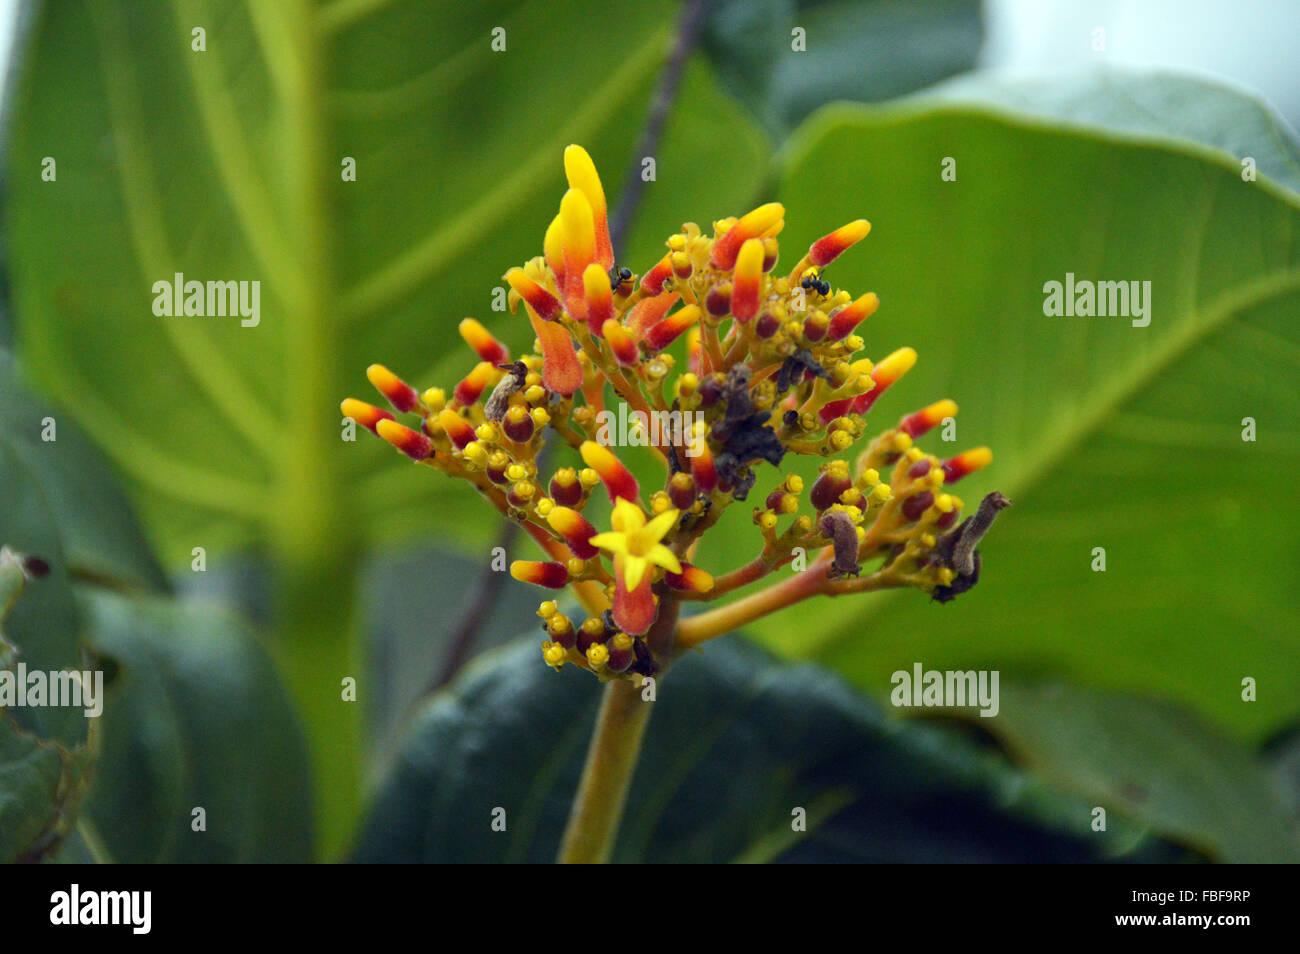 Flower and buds closeup at chapada dos veadeiros,Goias Brazil - Stock Image